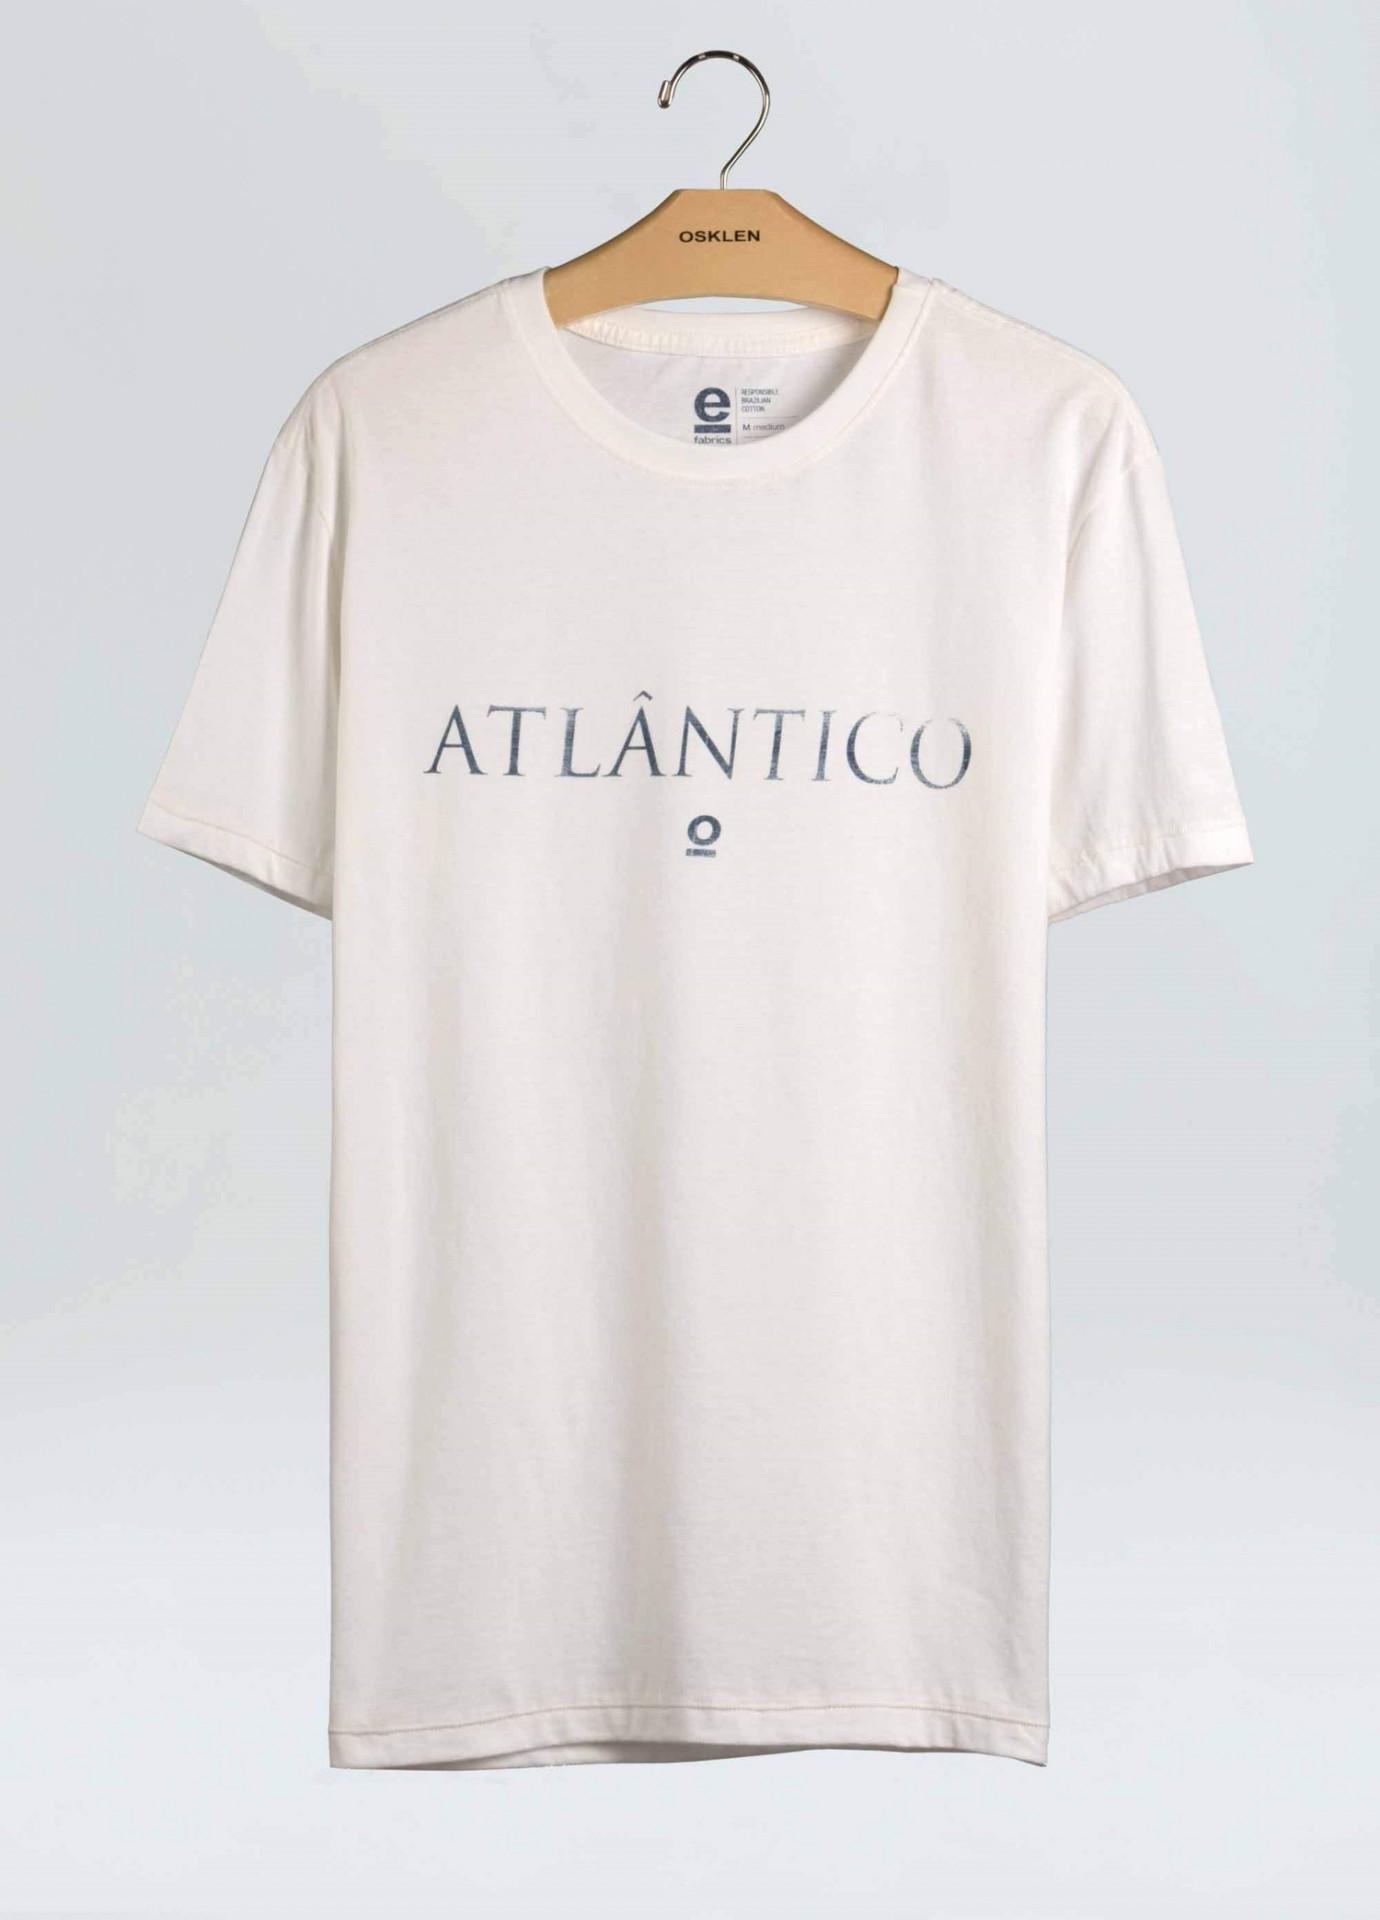 T-SHIRT ATLÂNTICO OSKLEN